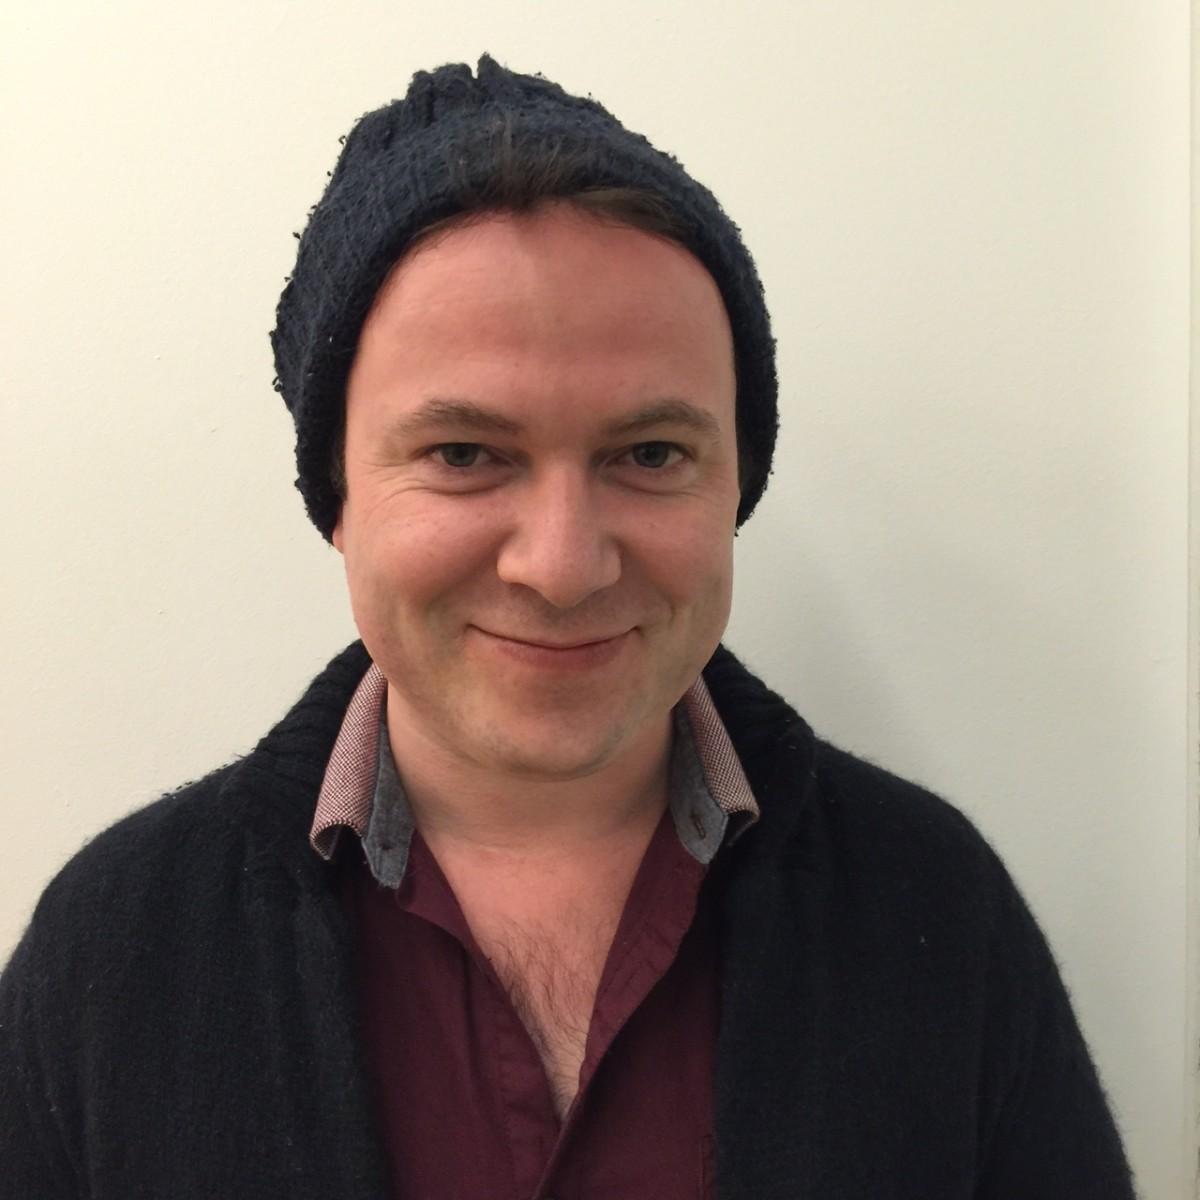 Director, Declan Loftus